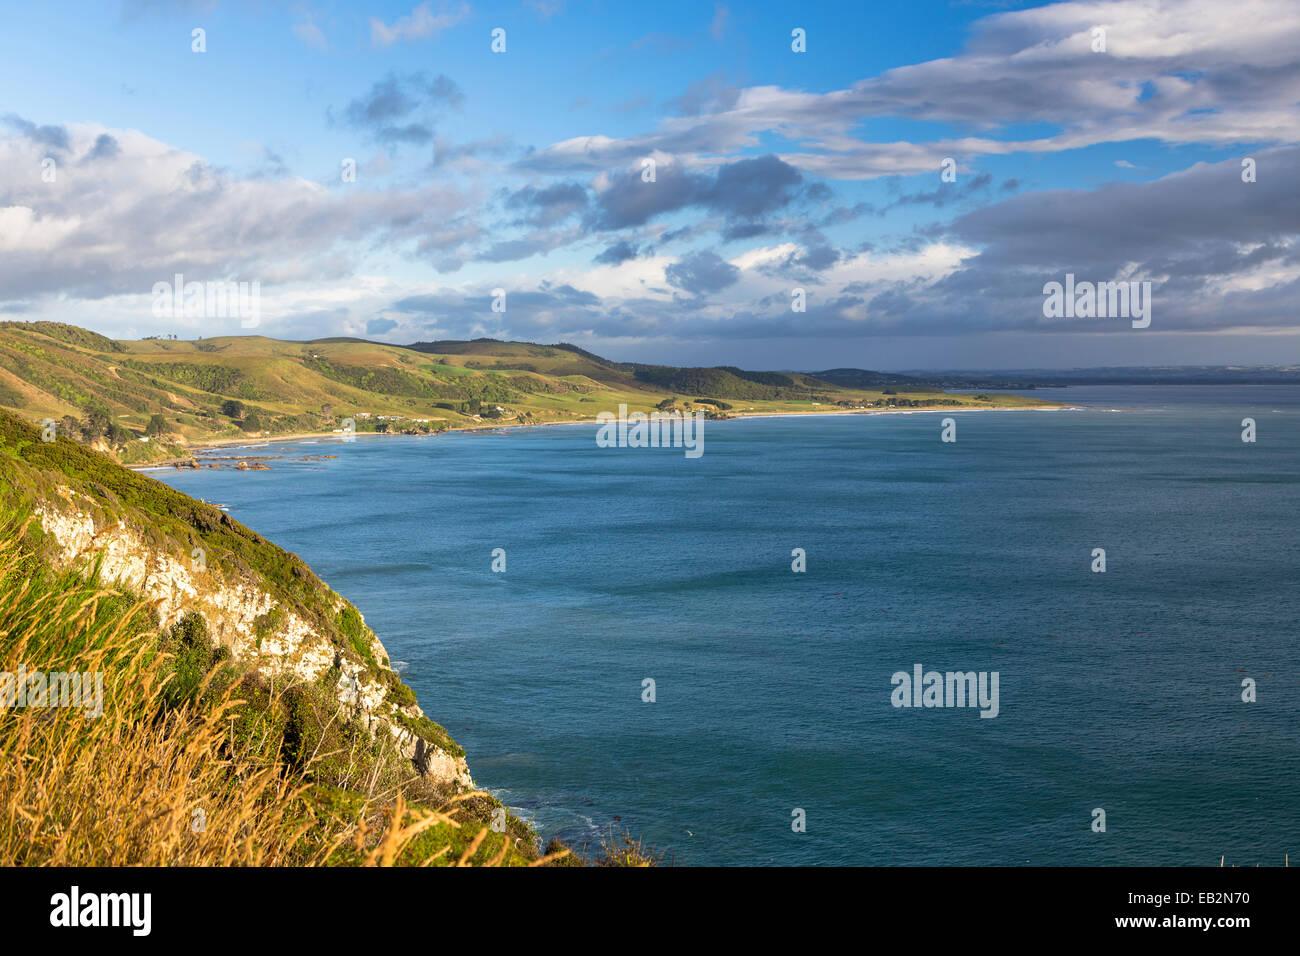 The Catlins in the morning light, Ahuriri Flat, Otago, New Zealand - Stock Image